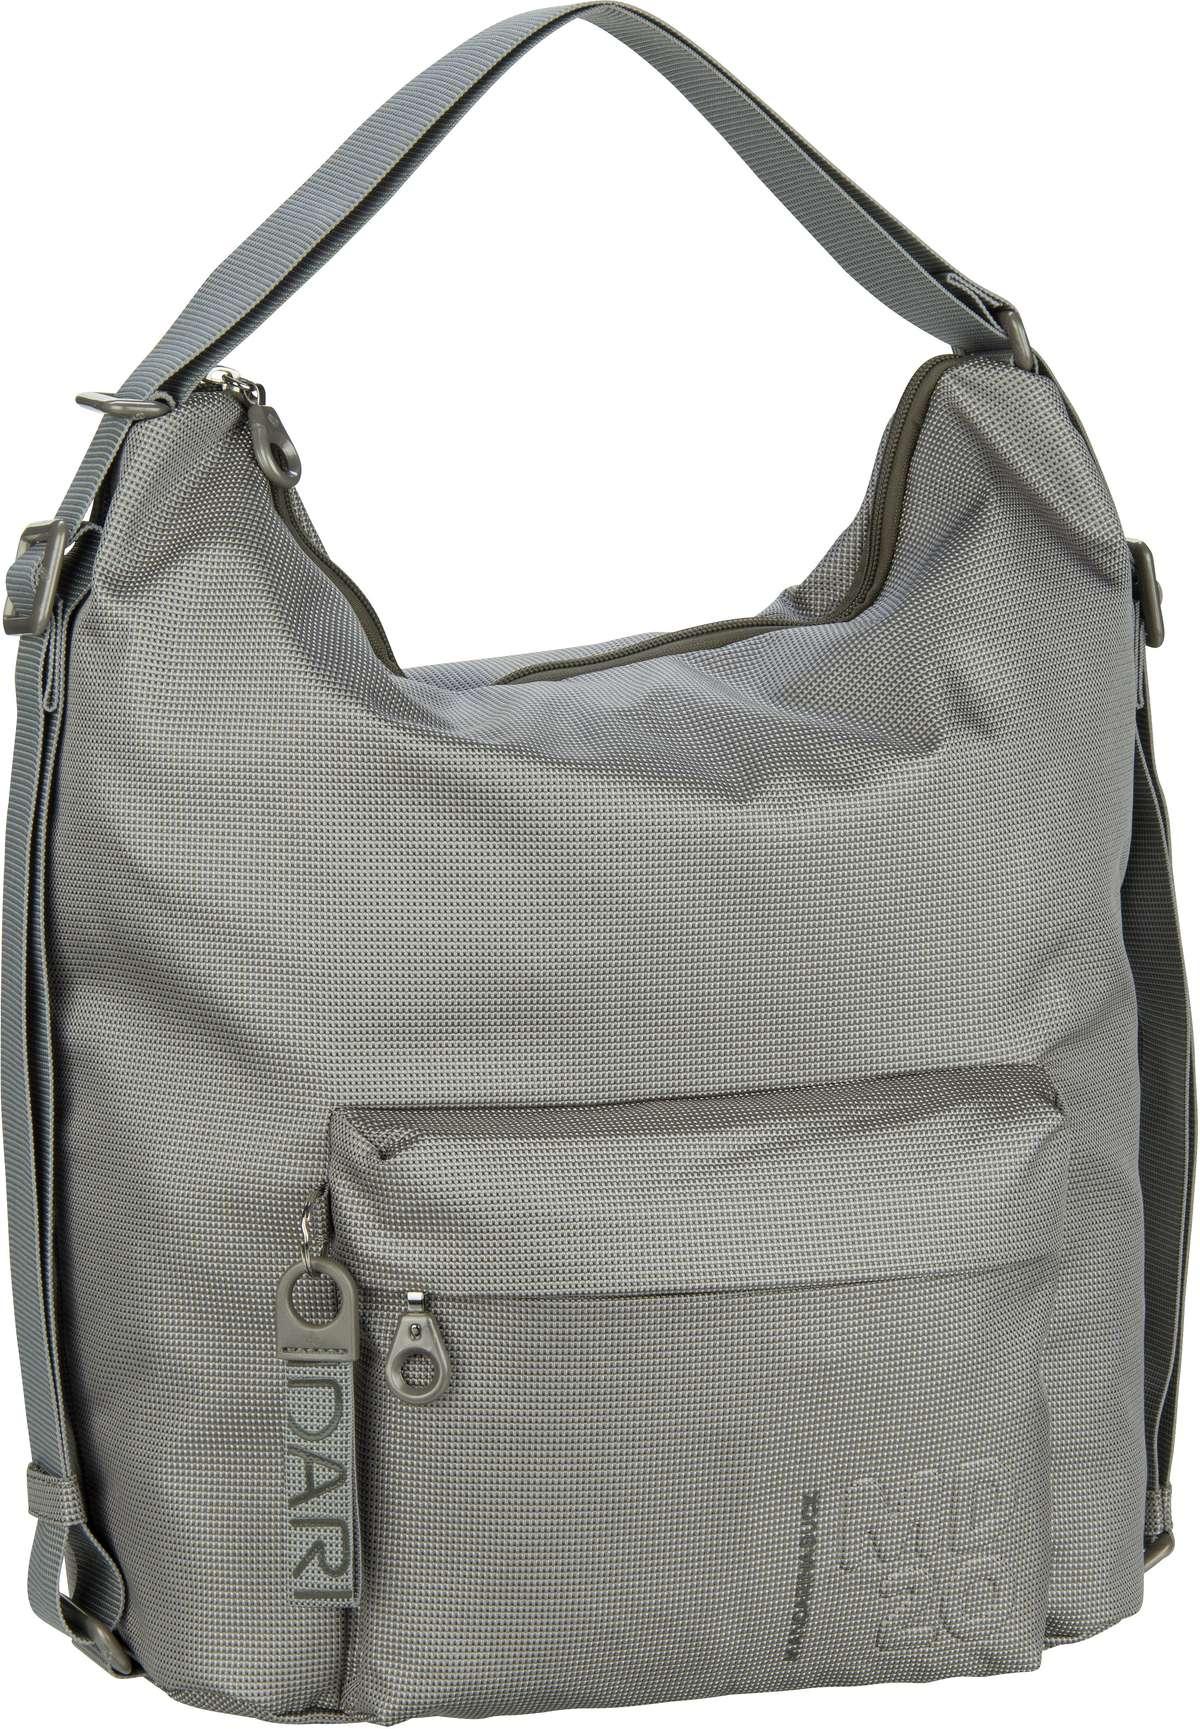 Handtasche MD20 Hobo Backpack QMT09 Soldier